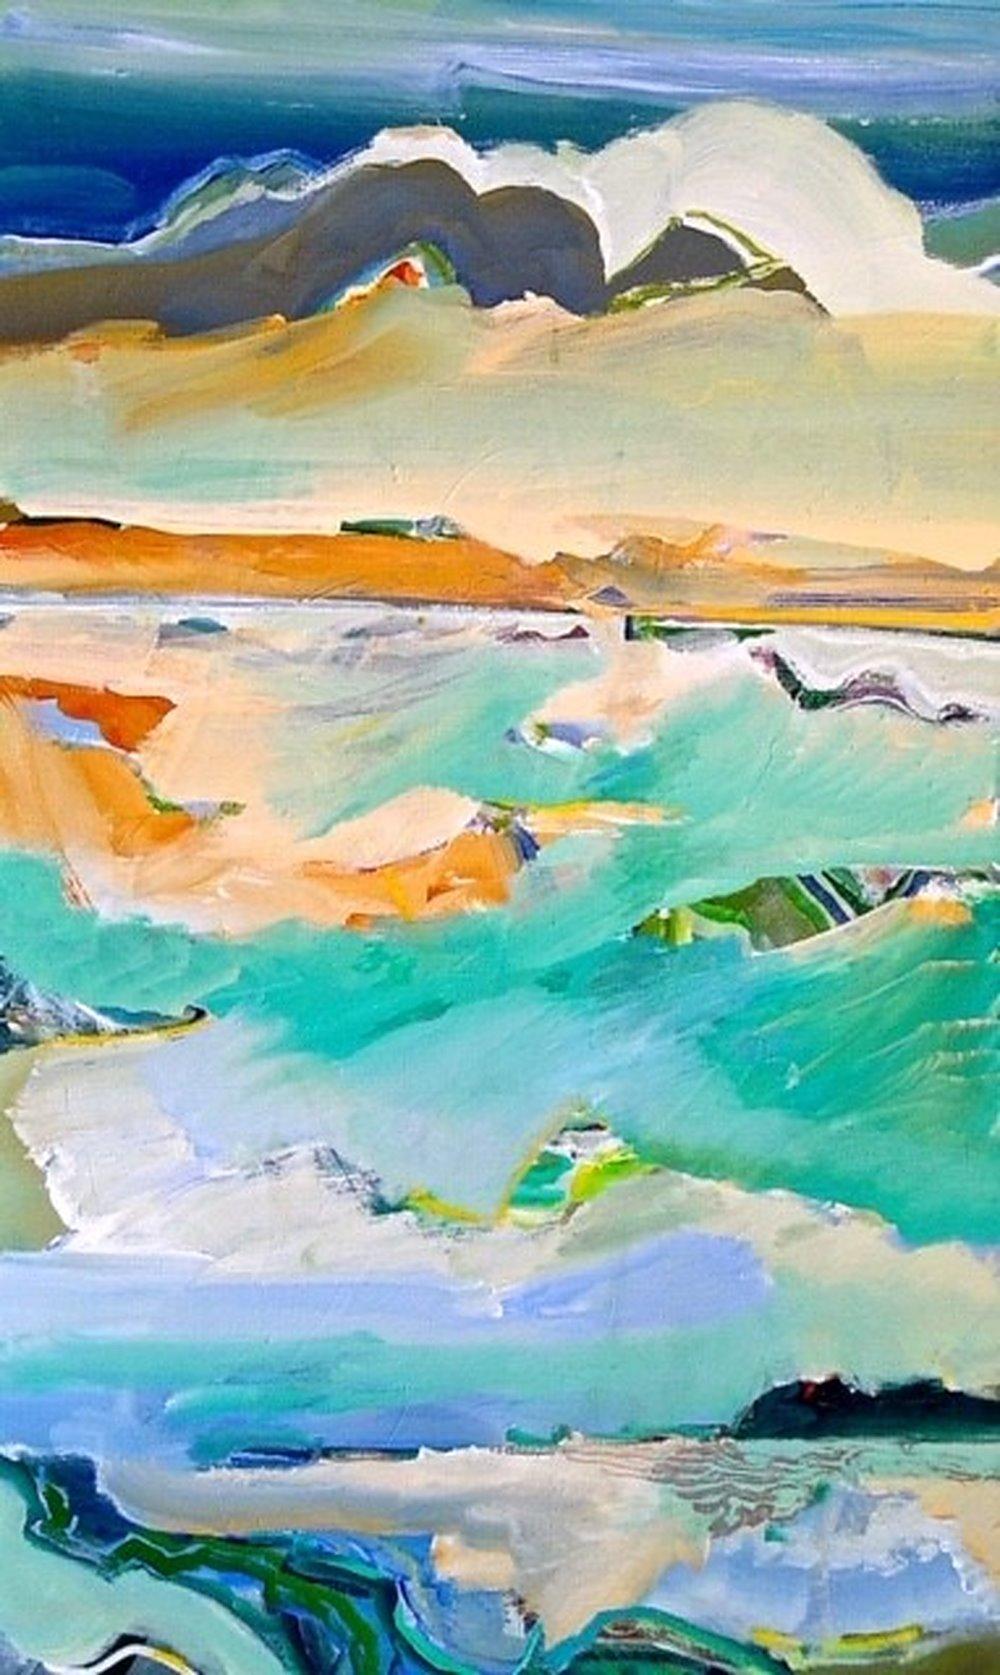 oceana by Kevan Krasnoff | ArtworkNetwork.com